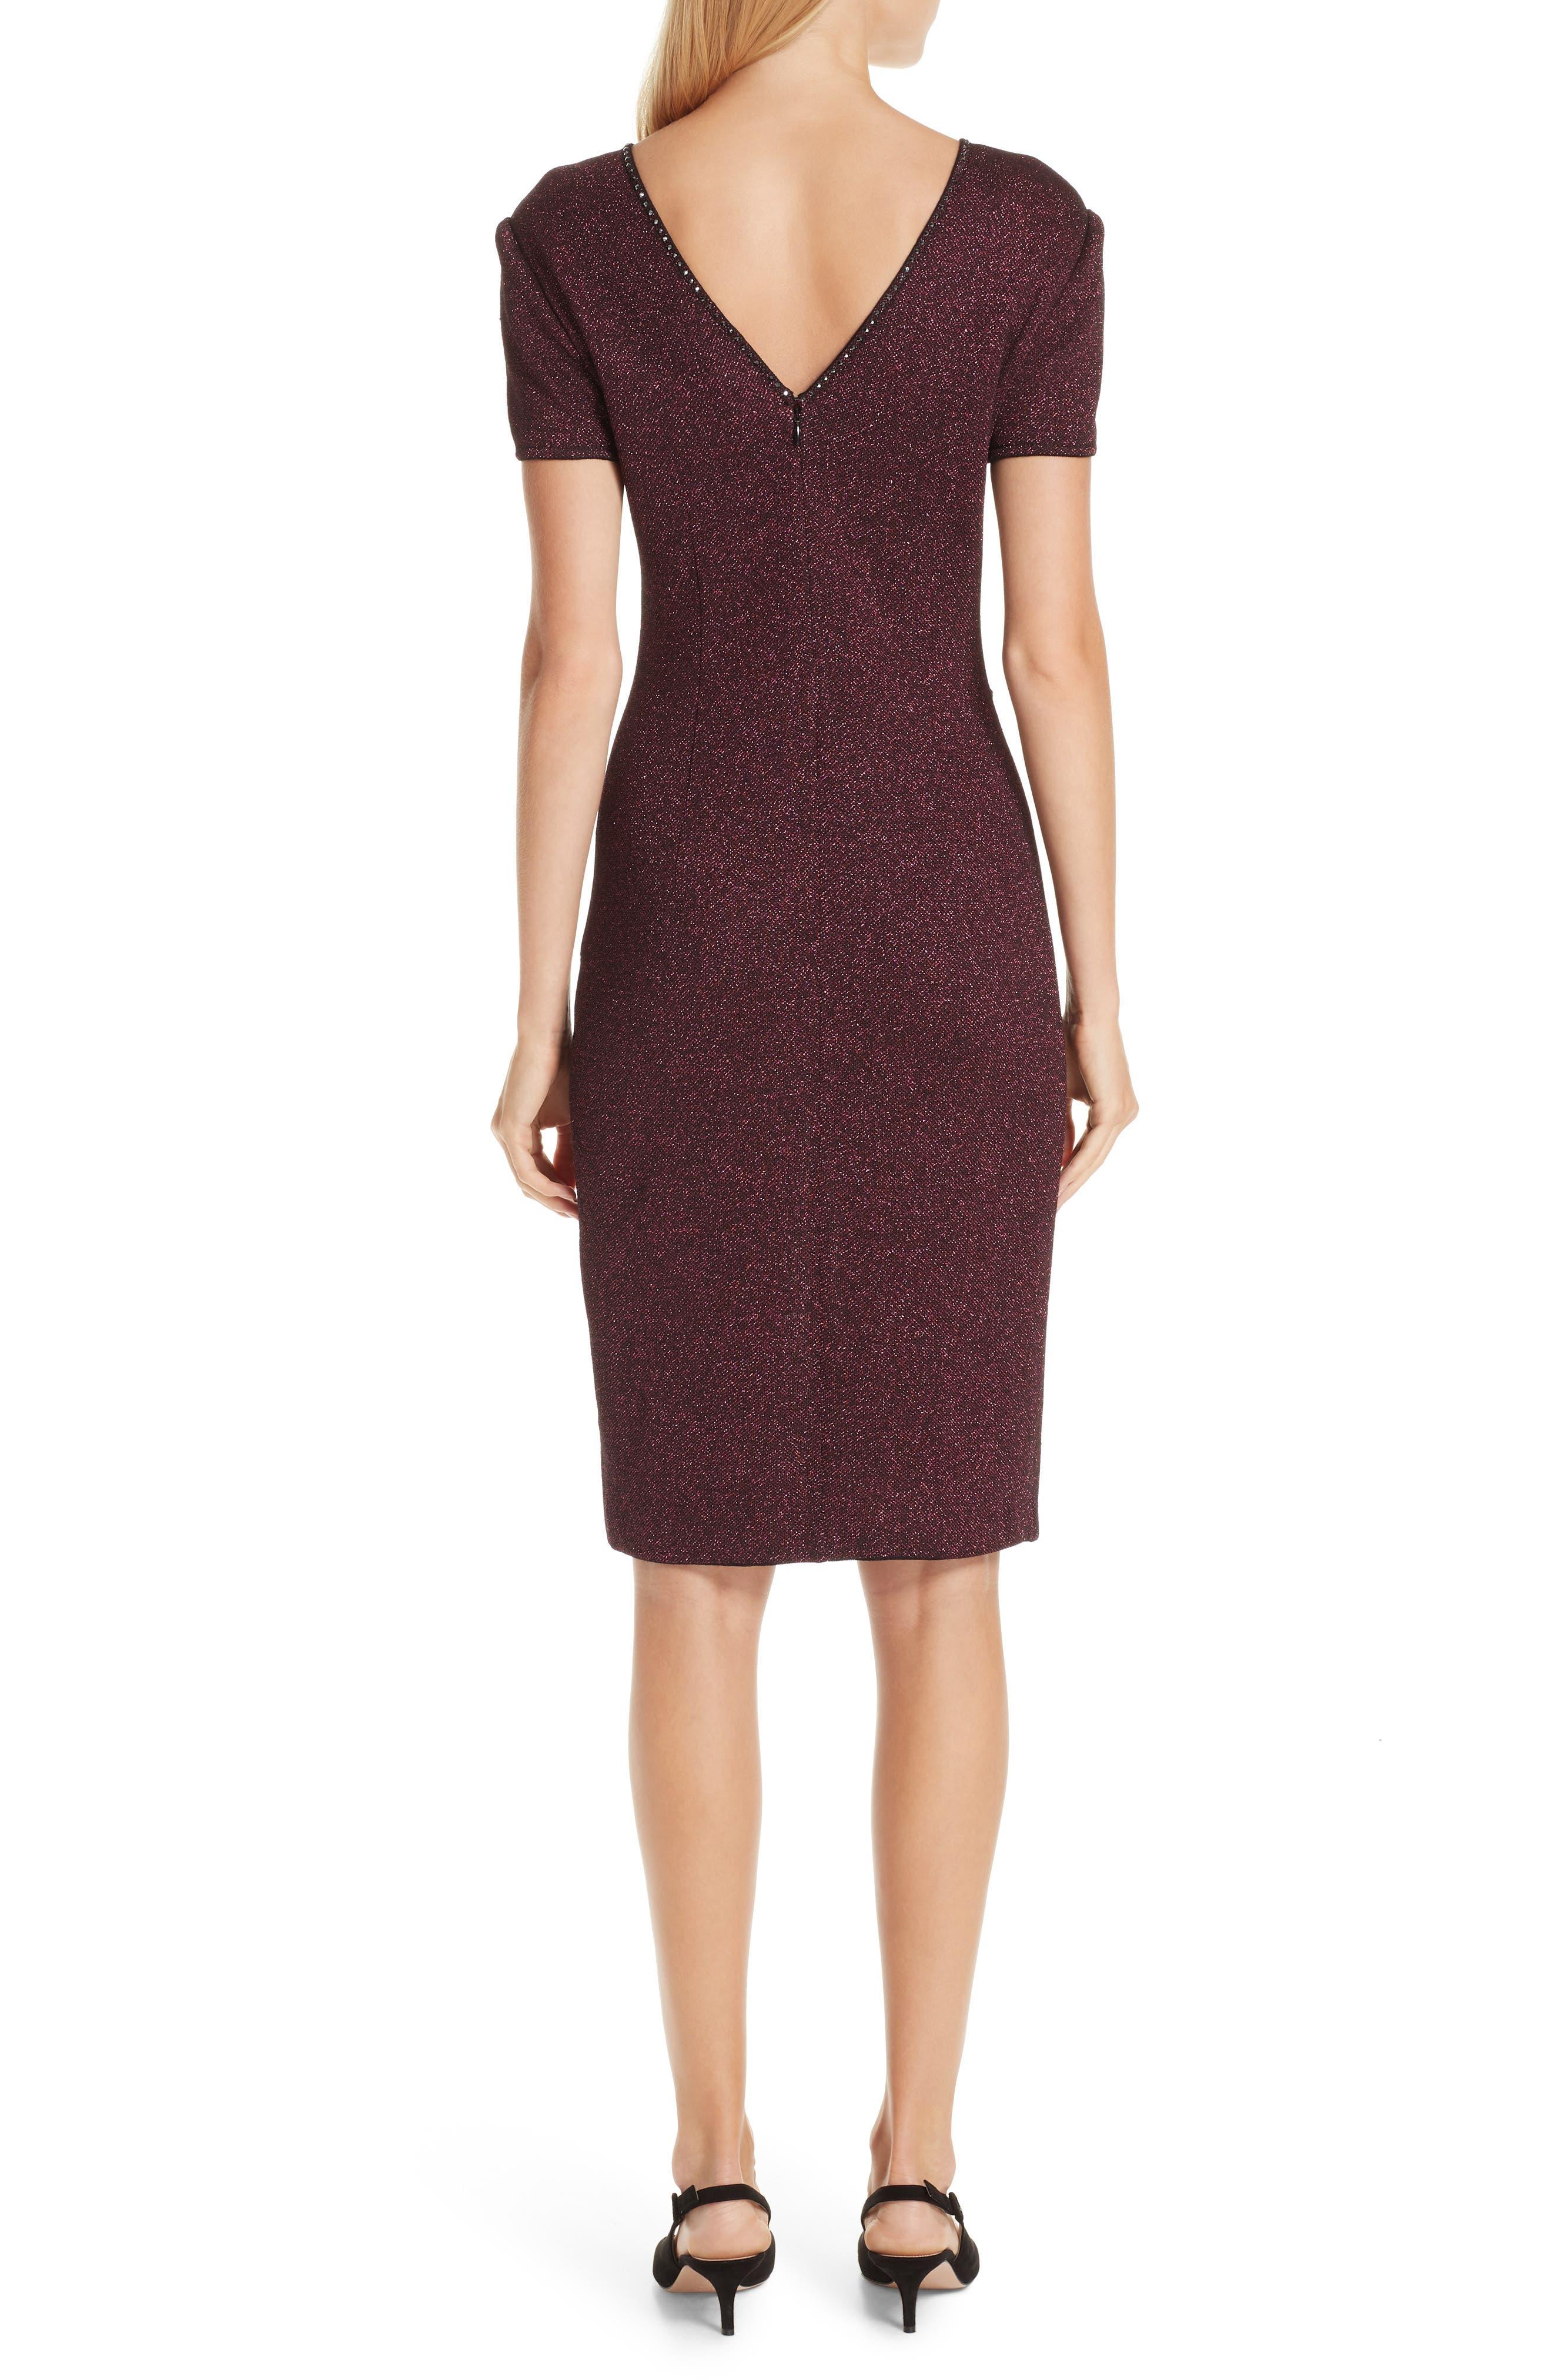 Mod Metallic Knit Sheath Dress,                             Alternate thumbnail 2, color,                             DARK PINK MULTI